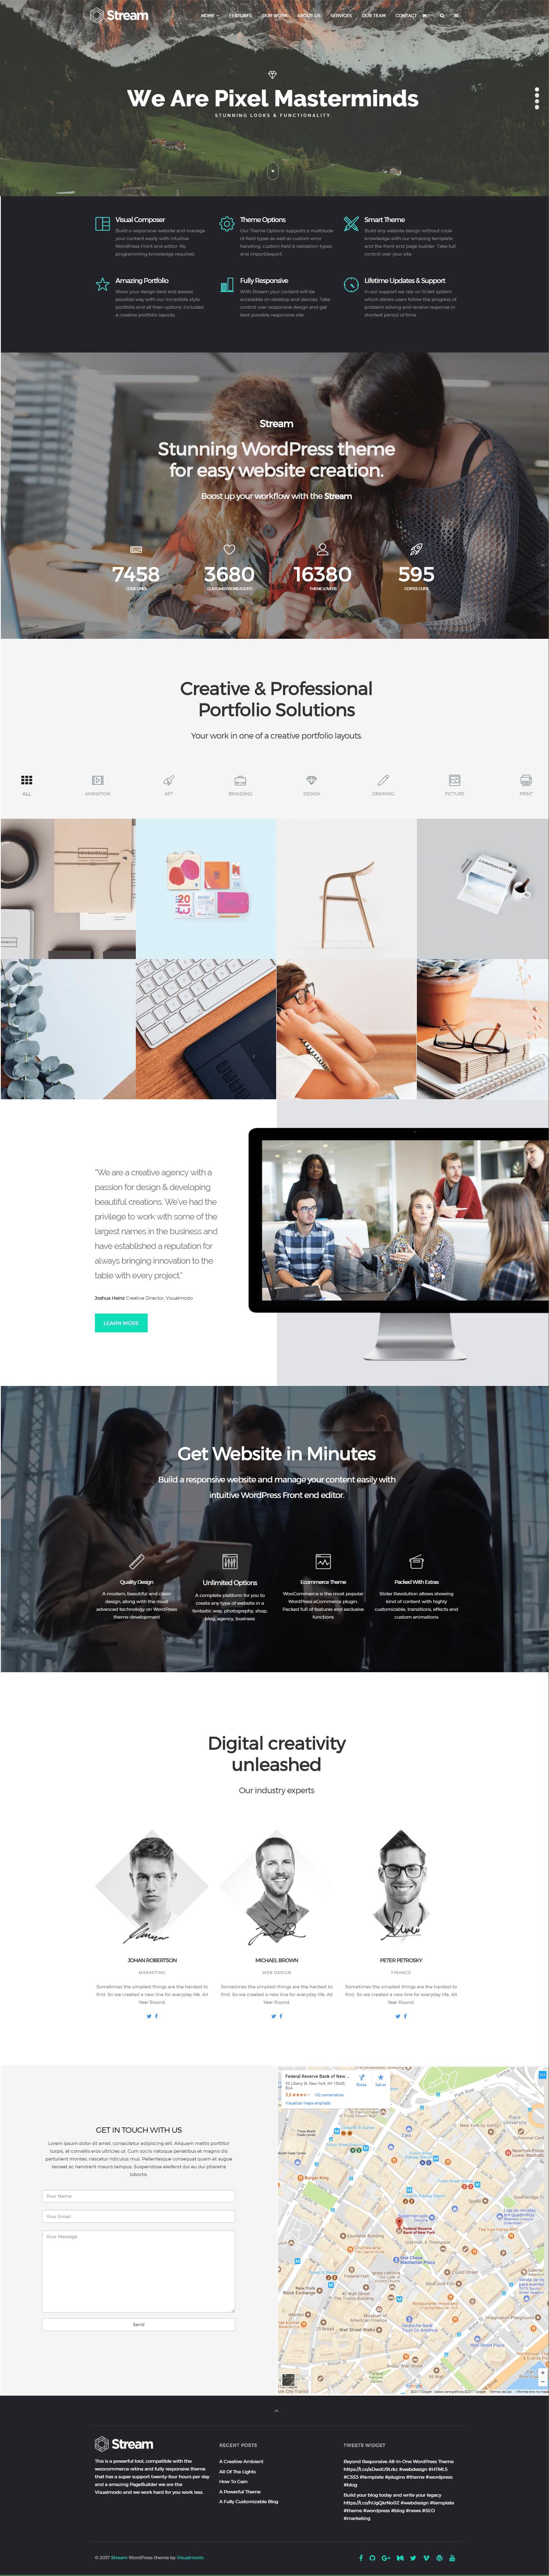 Stream WordPress theme Screenshots from demonstrative landing pages